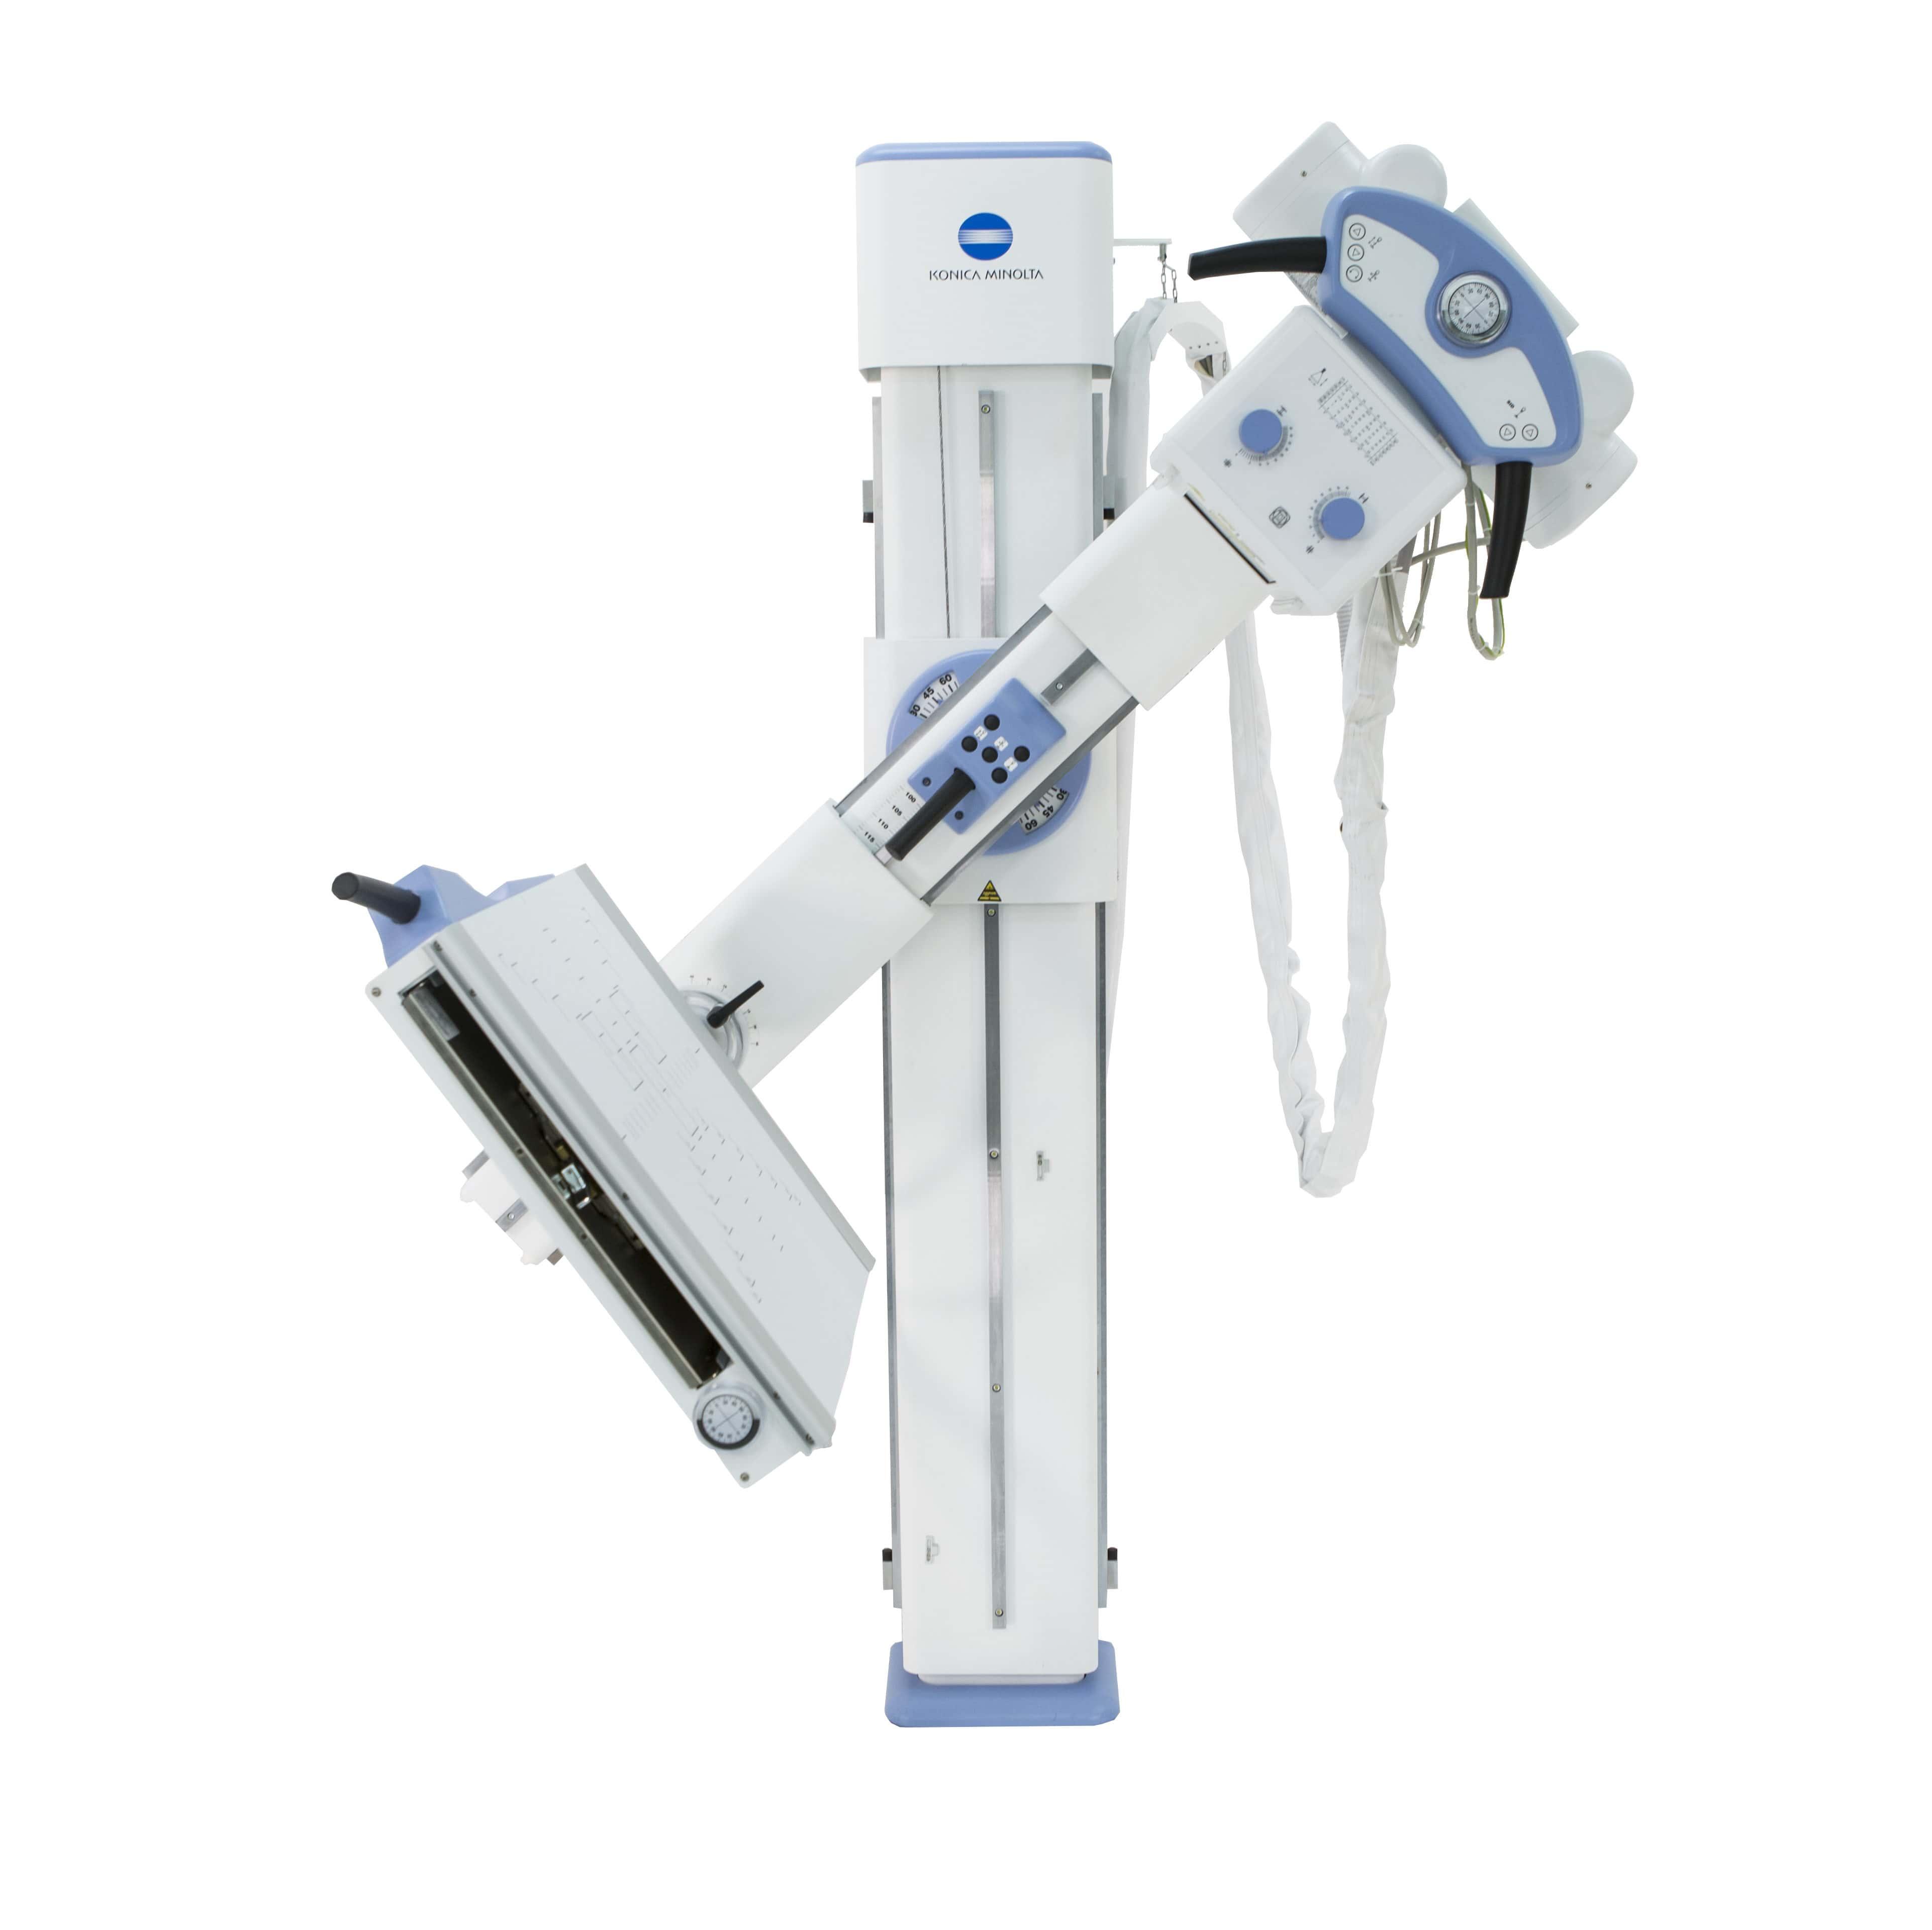 Konica Minolta Straight-Arm DR Room